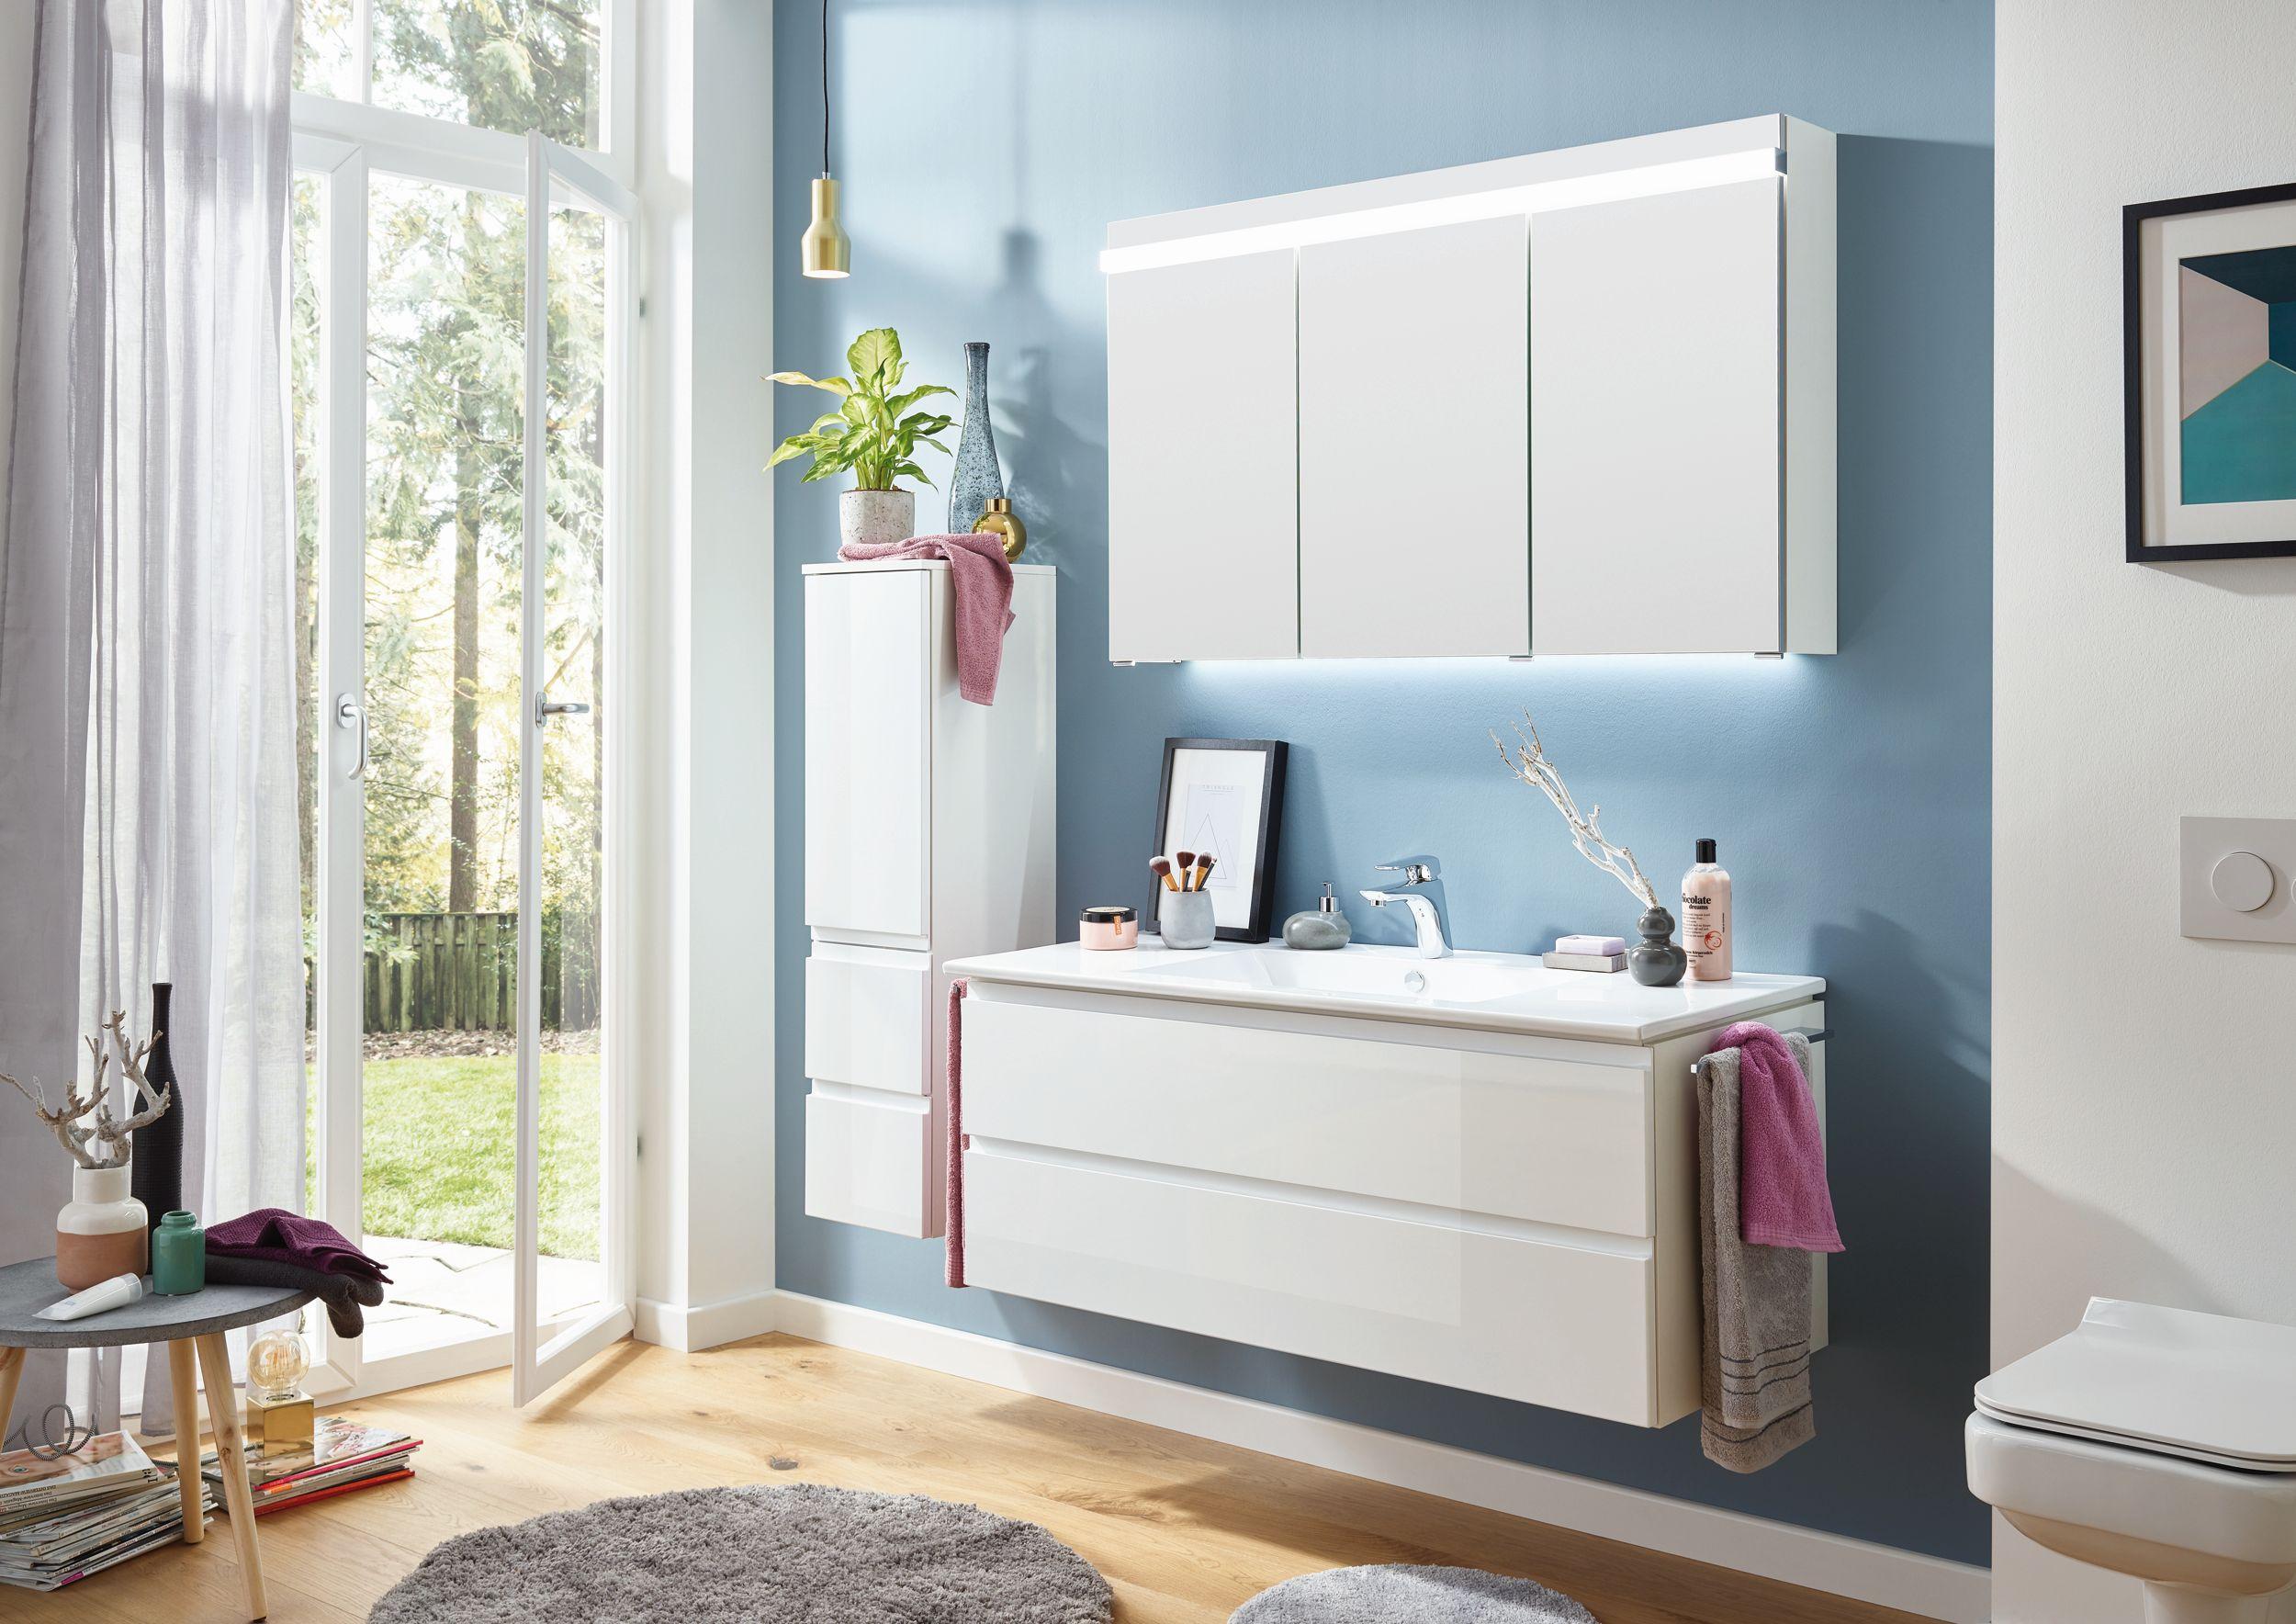 puris ace spiegelschrank 120cm breit s2a432s72 badm bel 1. Black Bedroom Furniture Sets. Home Design Ideas